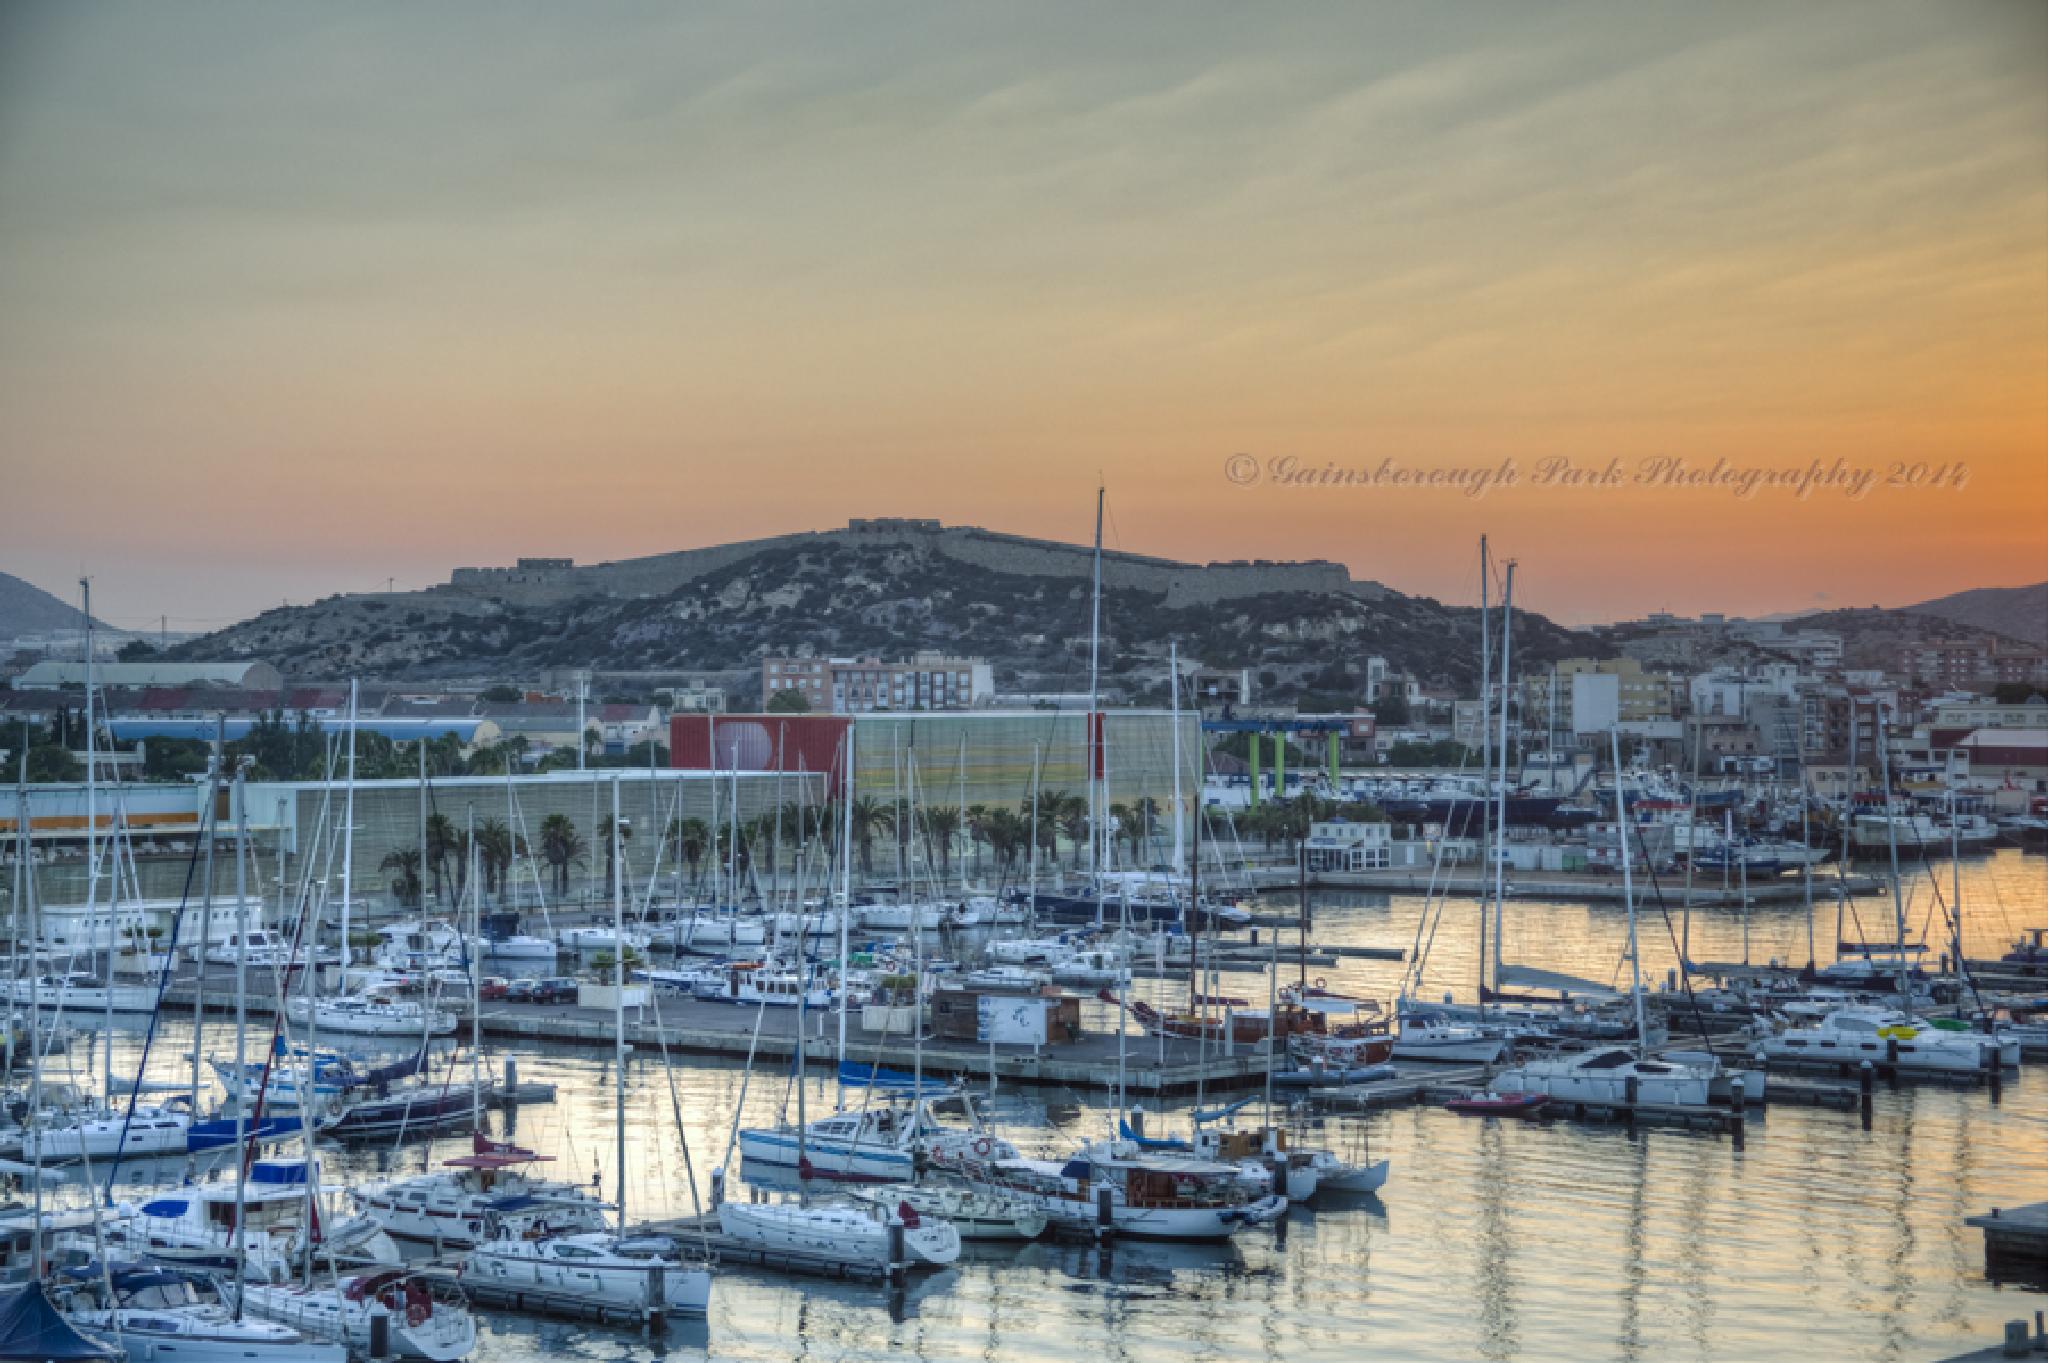 Cartagena, Spain by Gainsborough Park Photography